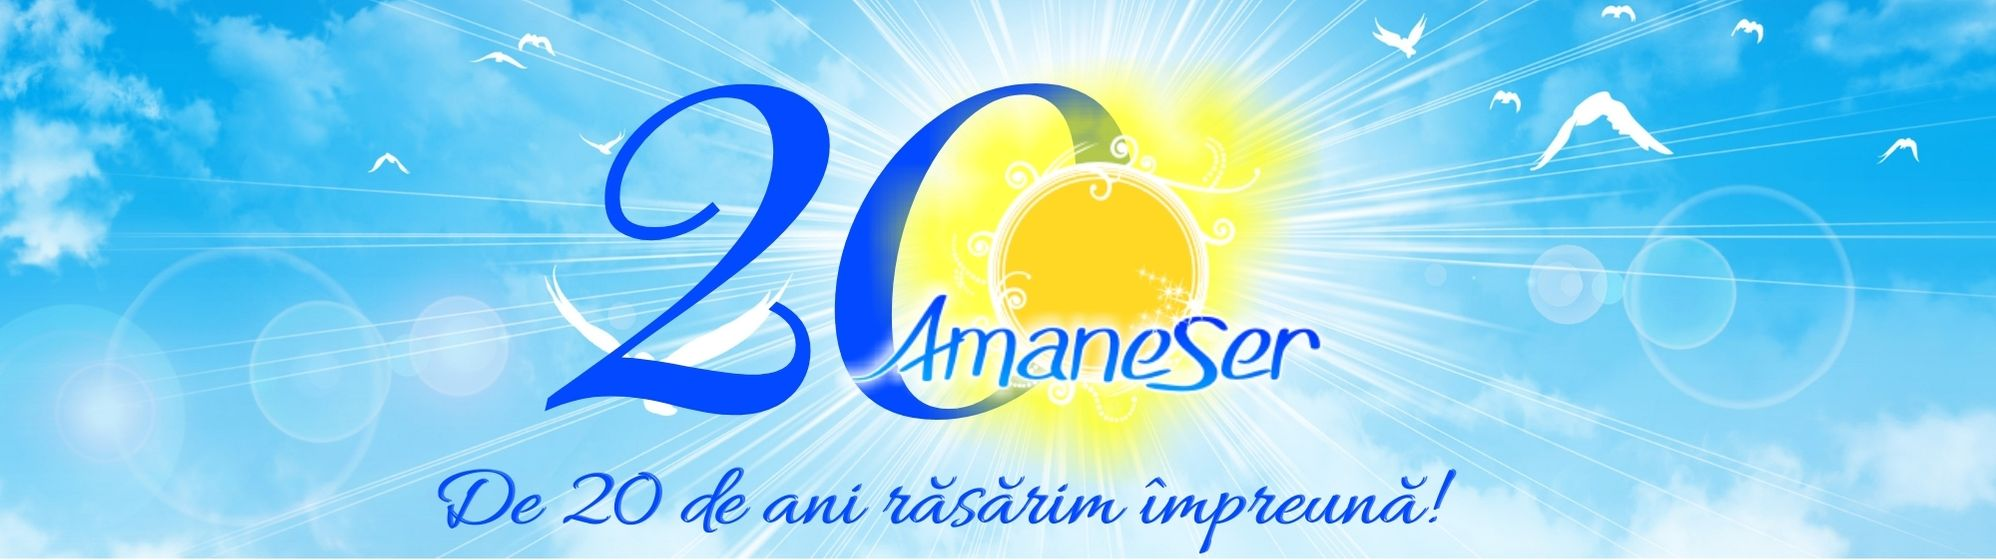 Centrul Amaneser a implinir 20 de ani | dezvoltare personala, comunicare relationala, crestere spirituala